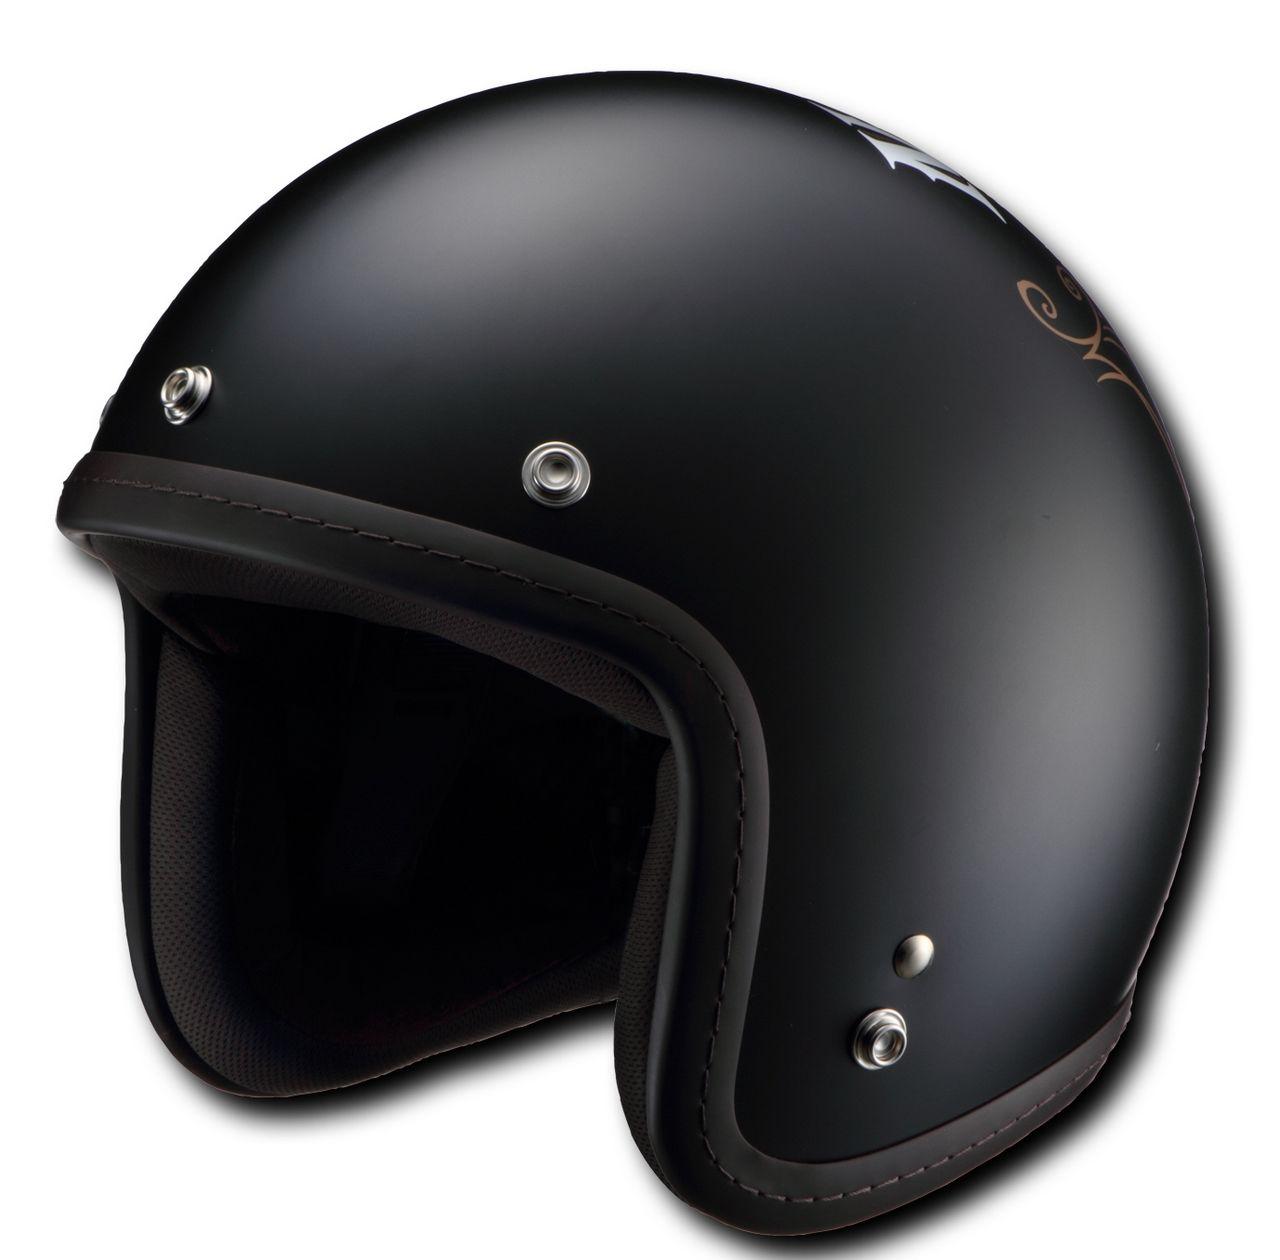 Knuckle Head RJ605 NoGutsNoGlory JET安全帽